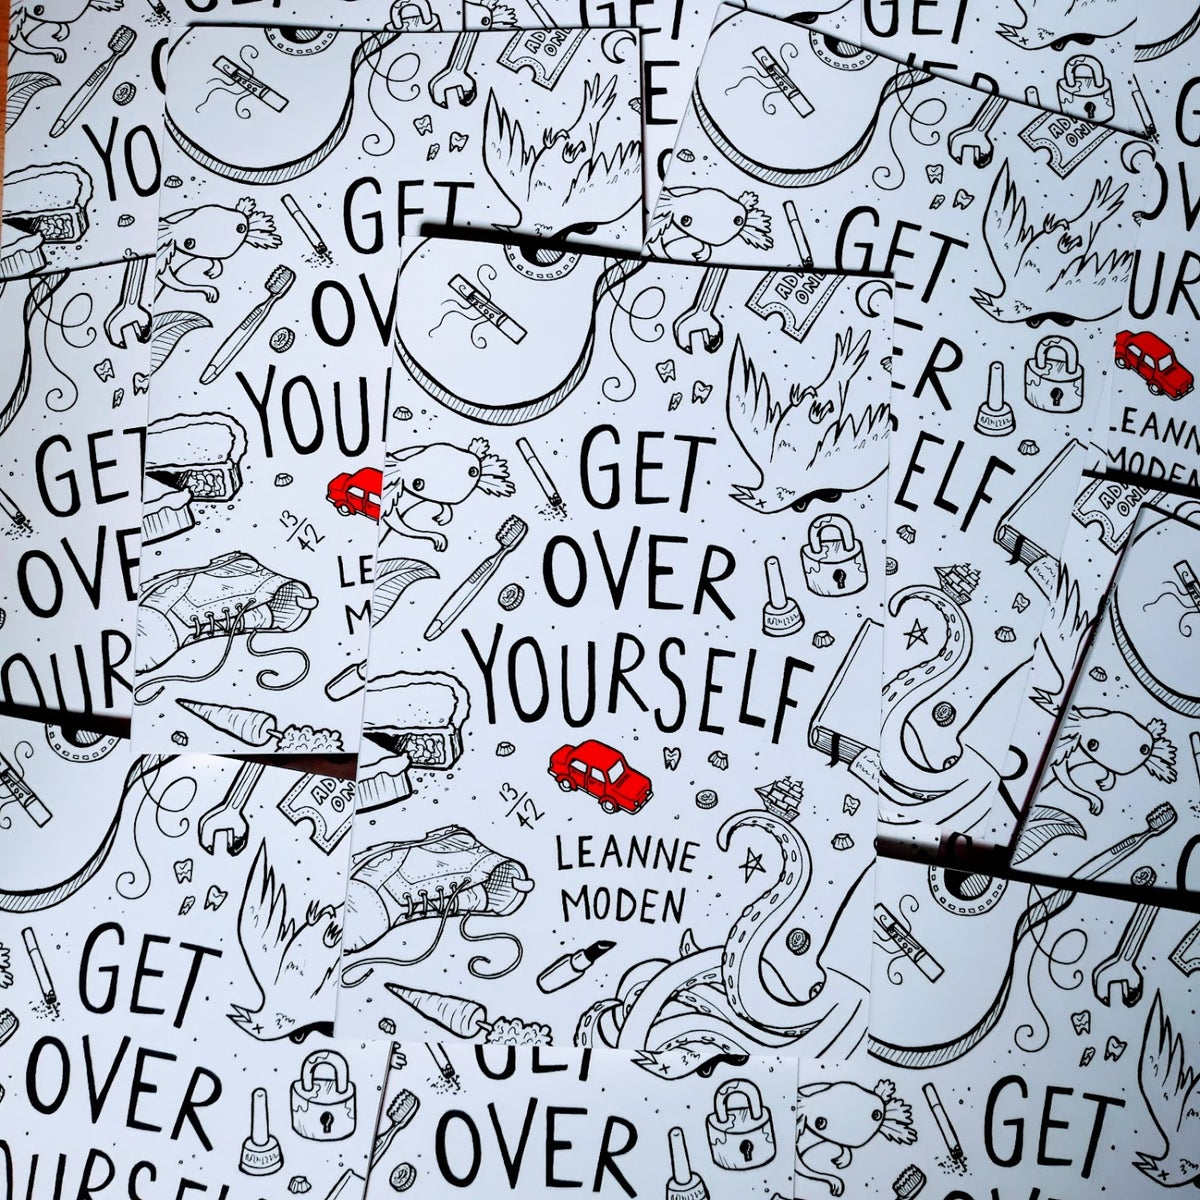 AUDIO DOWNLOAD - Get Over Yourself